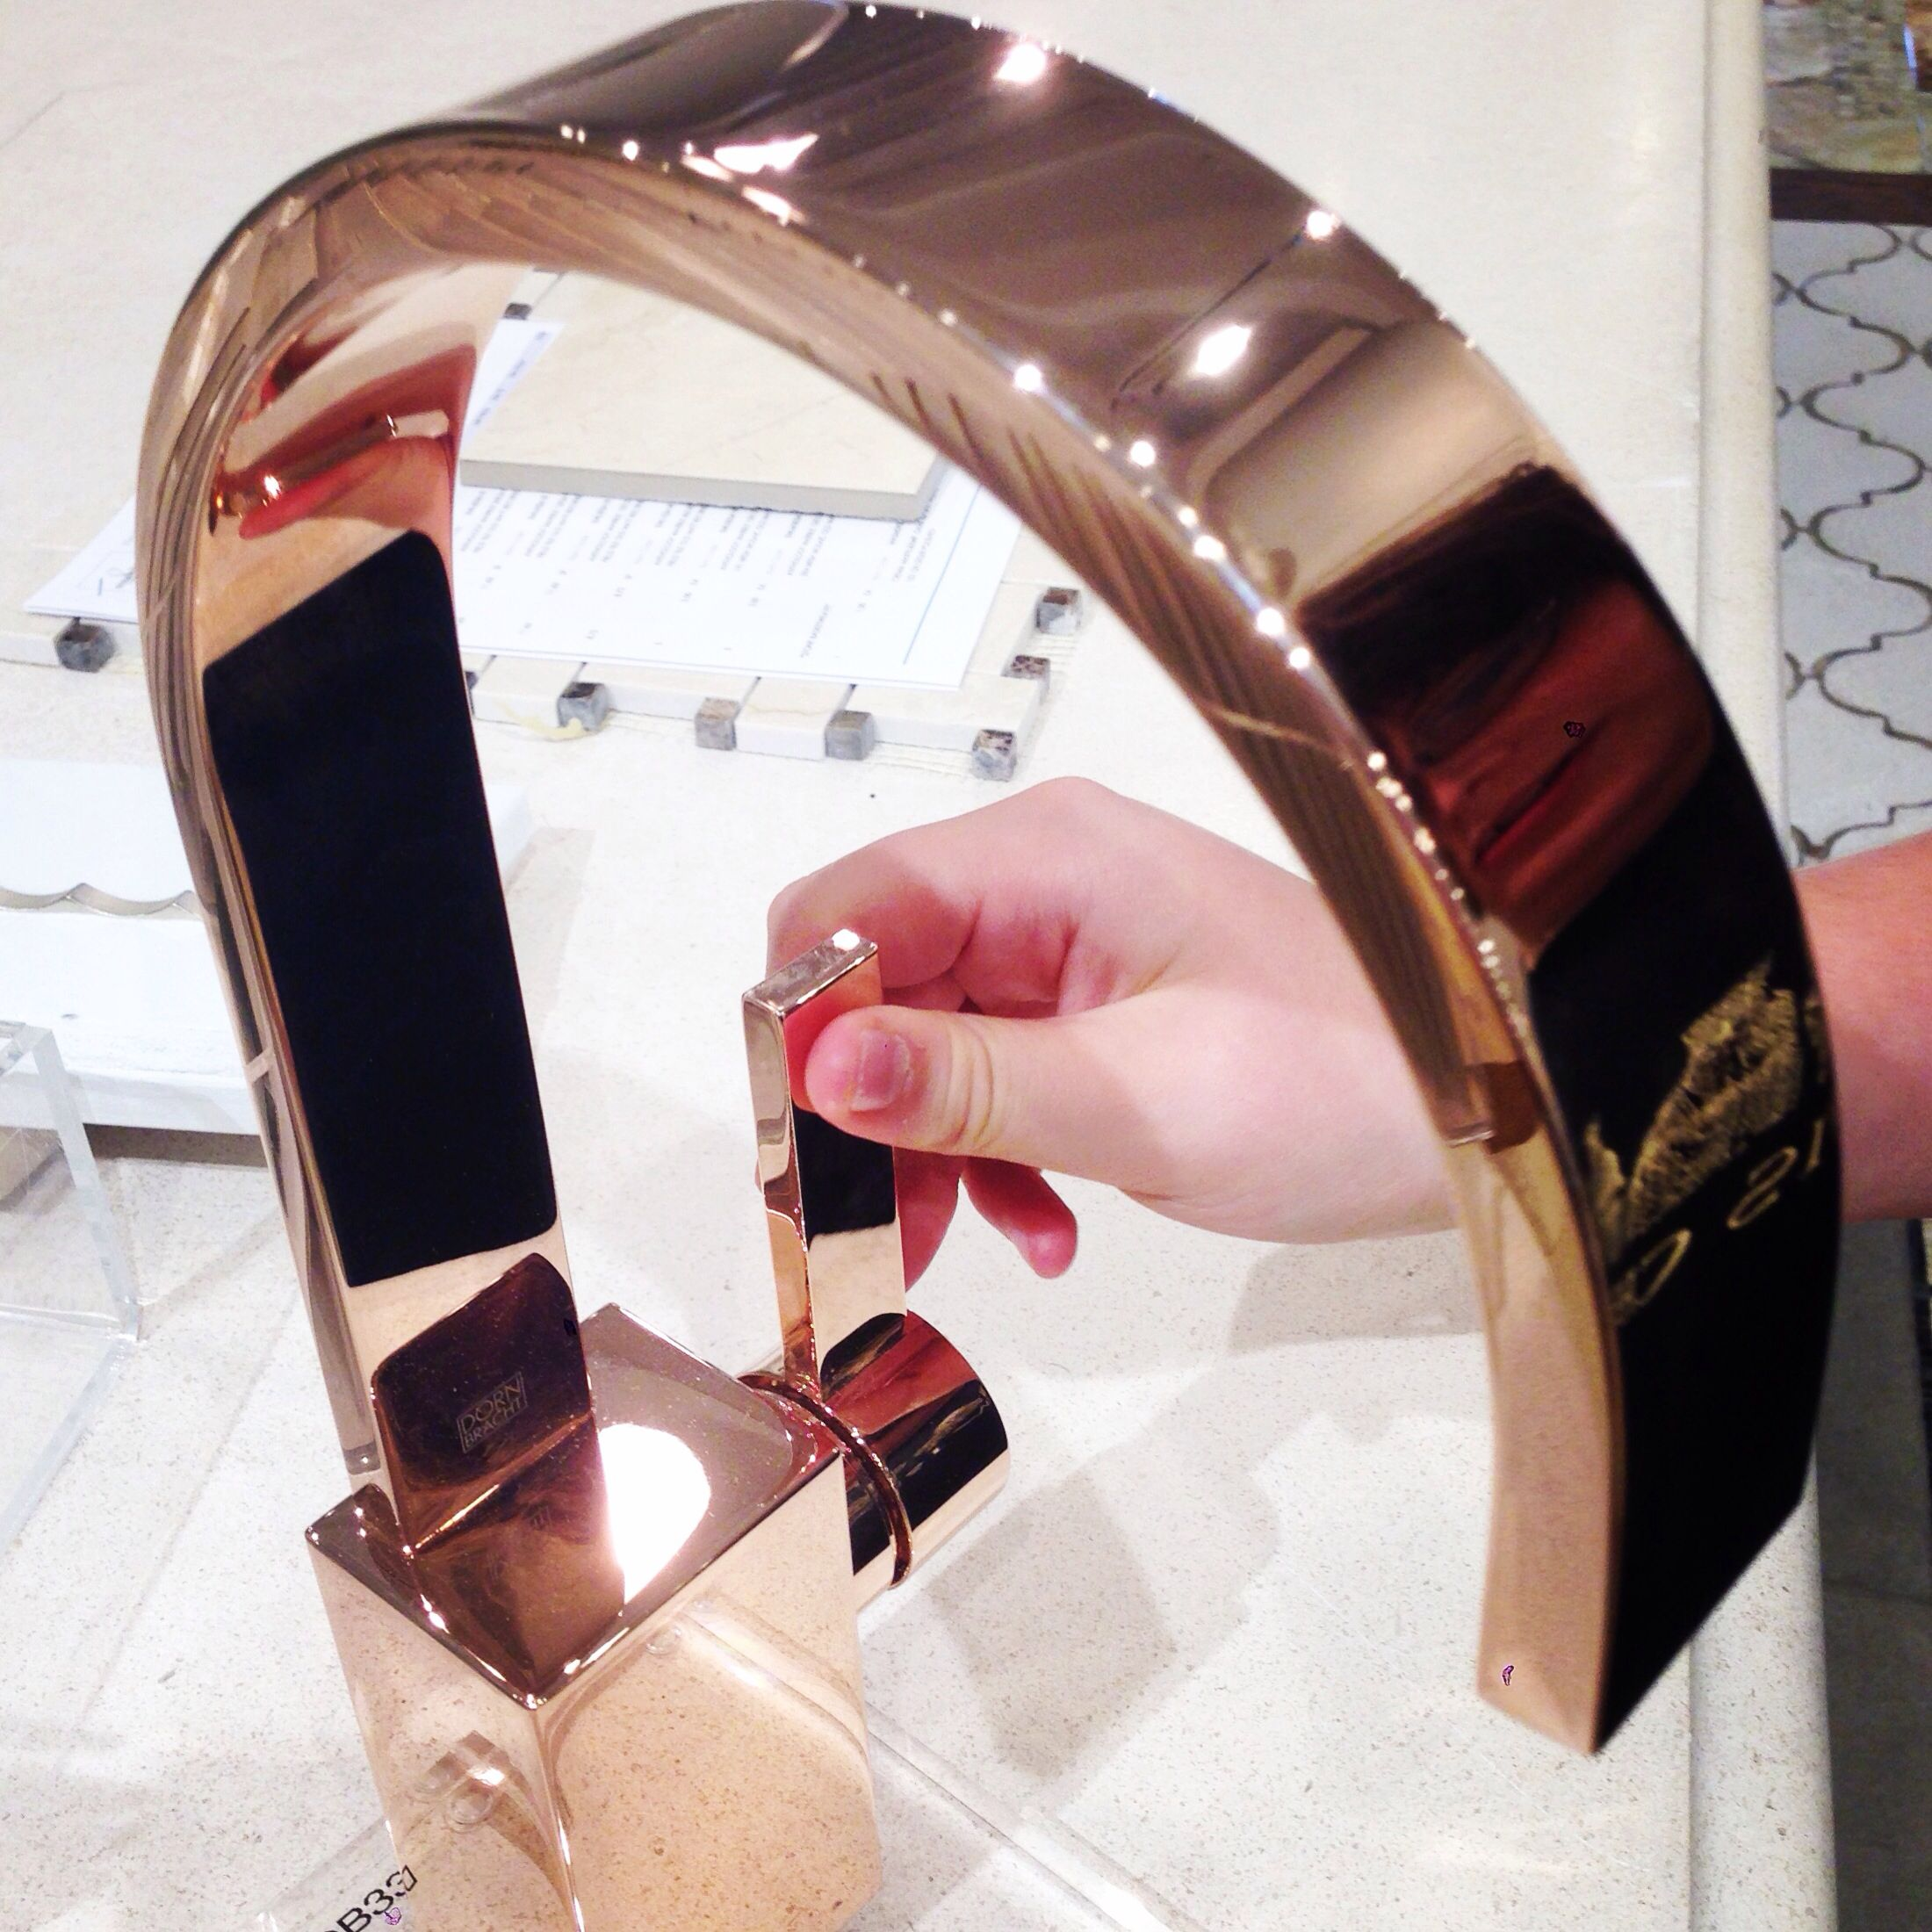 Dorn Amp Bracht Rose Gold Kitchen Faucet Available